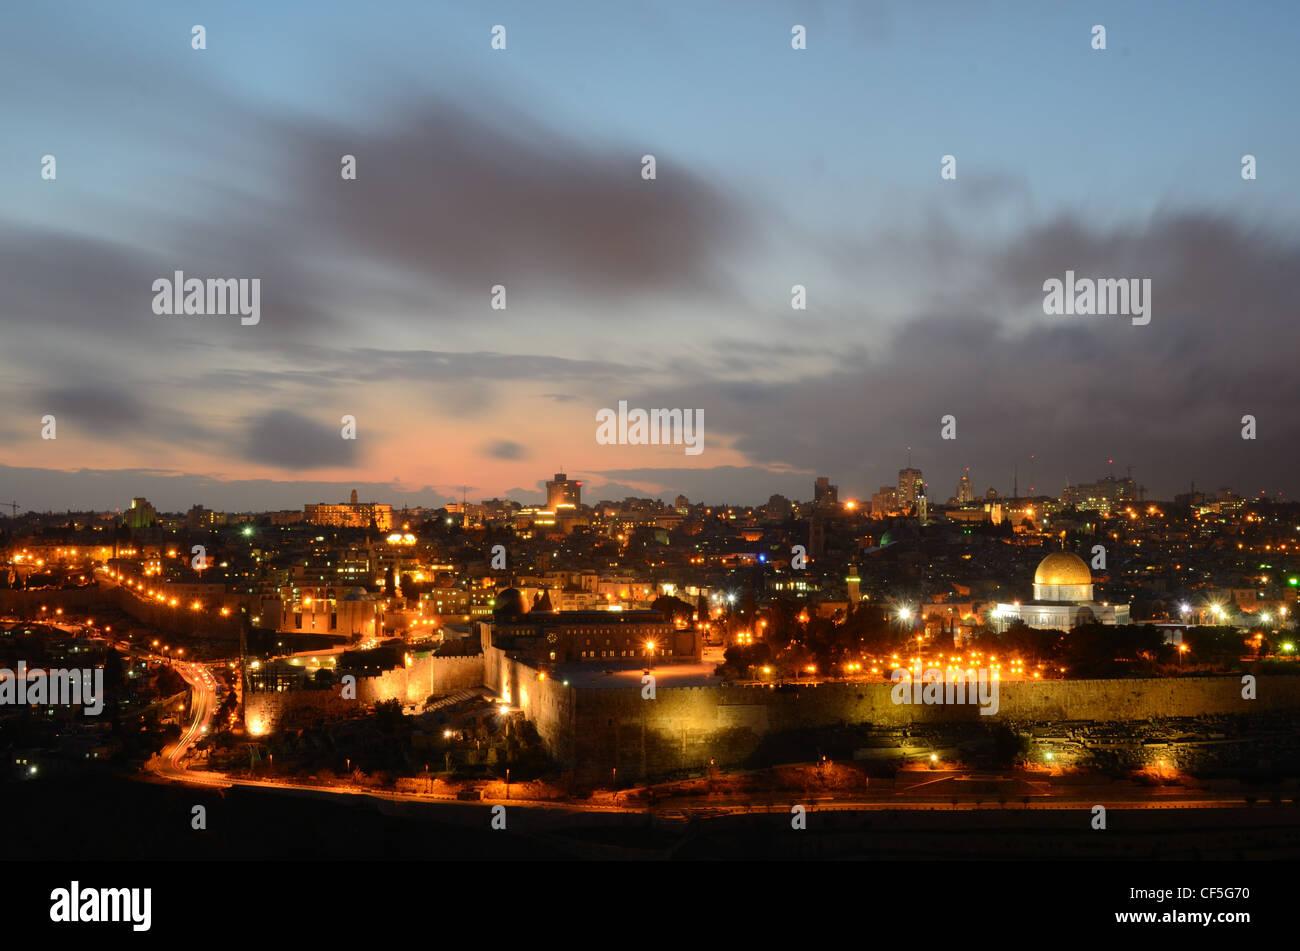 Skyline of the Old City of Jerusalem, Israel. - Stock Image